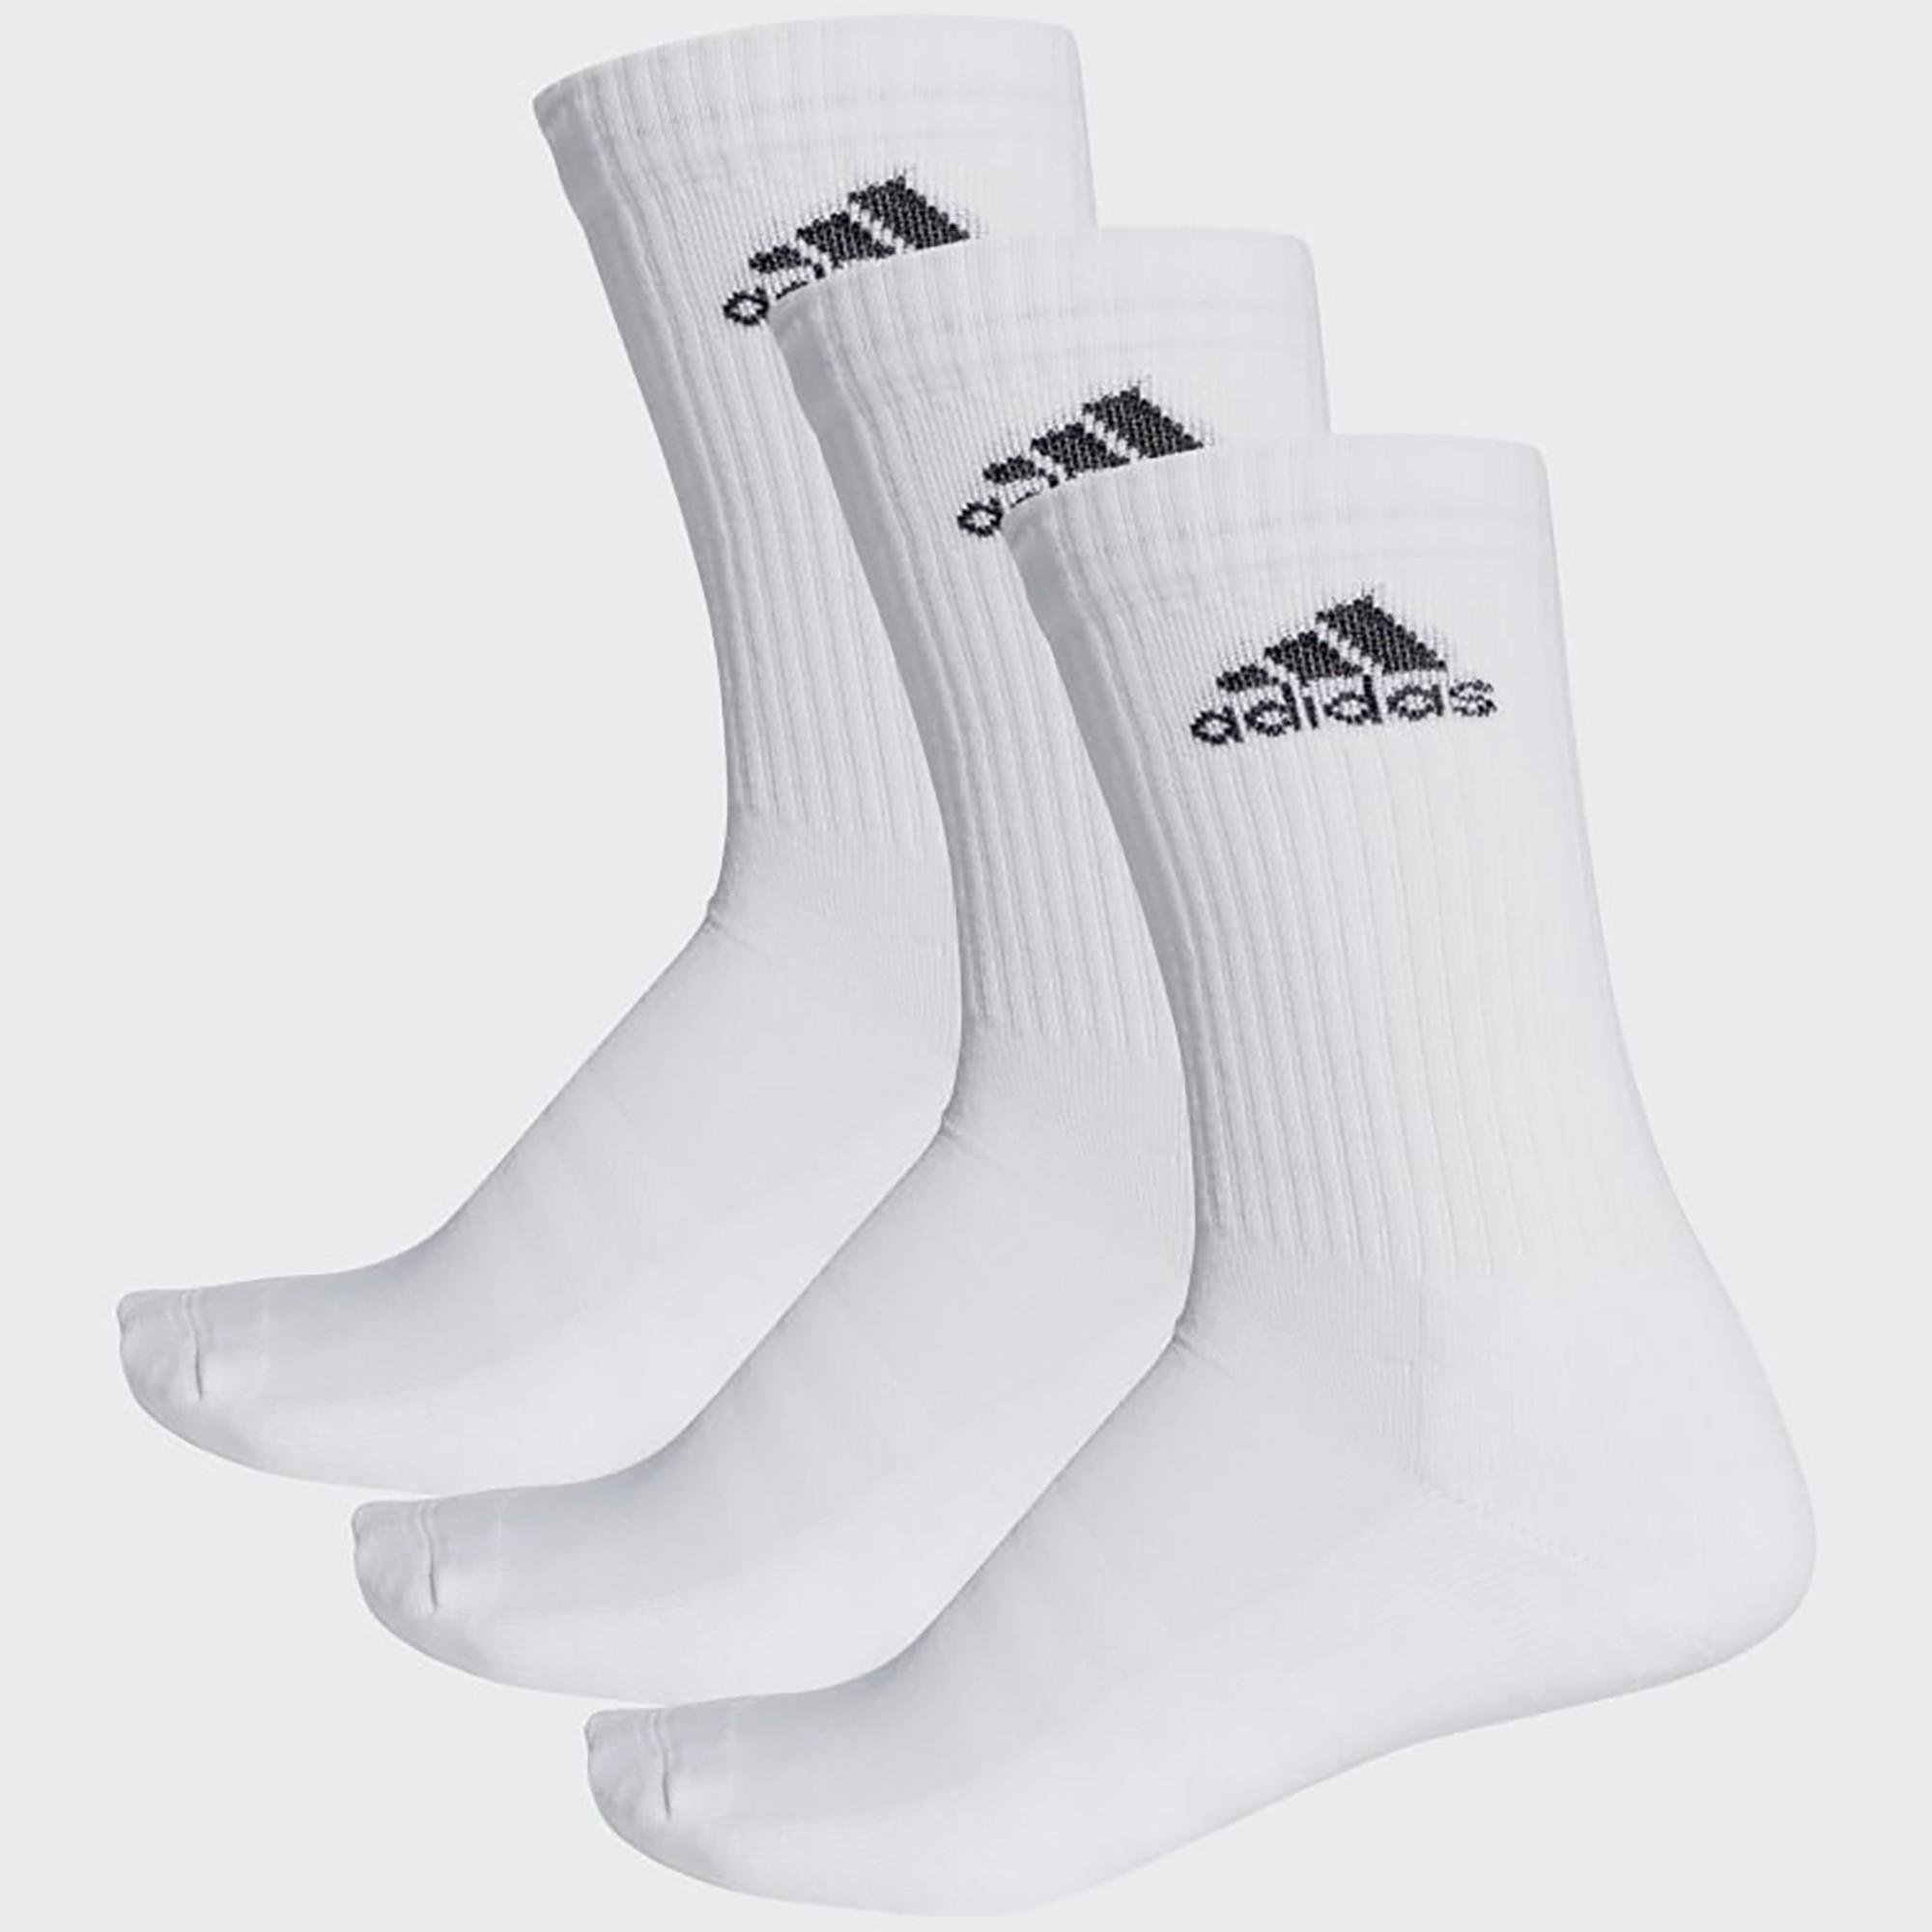 065d72a20 Adidas 3-Stripes Performance Crew Socks (3 Pairs) - White/Black -  Tennisnuts.com